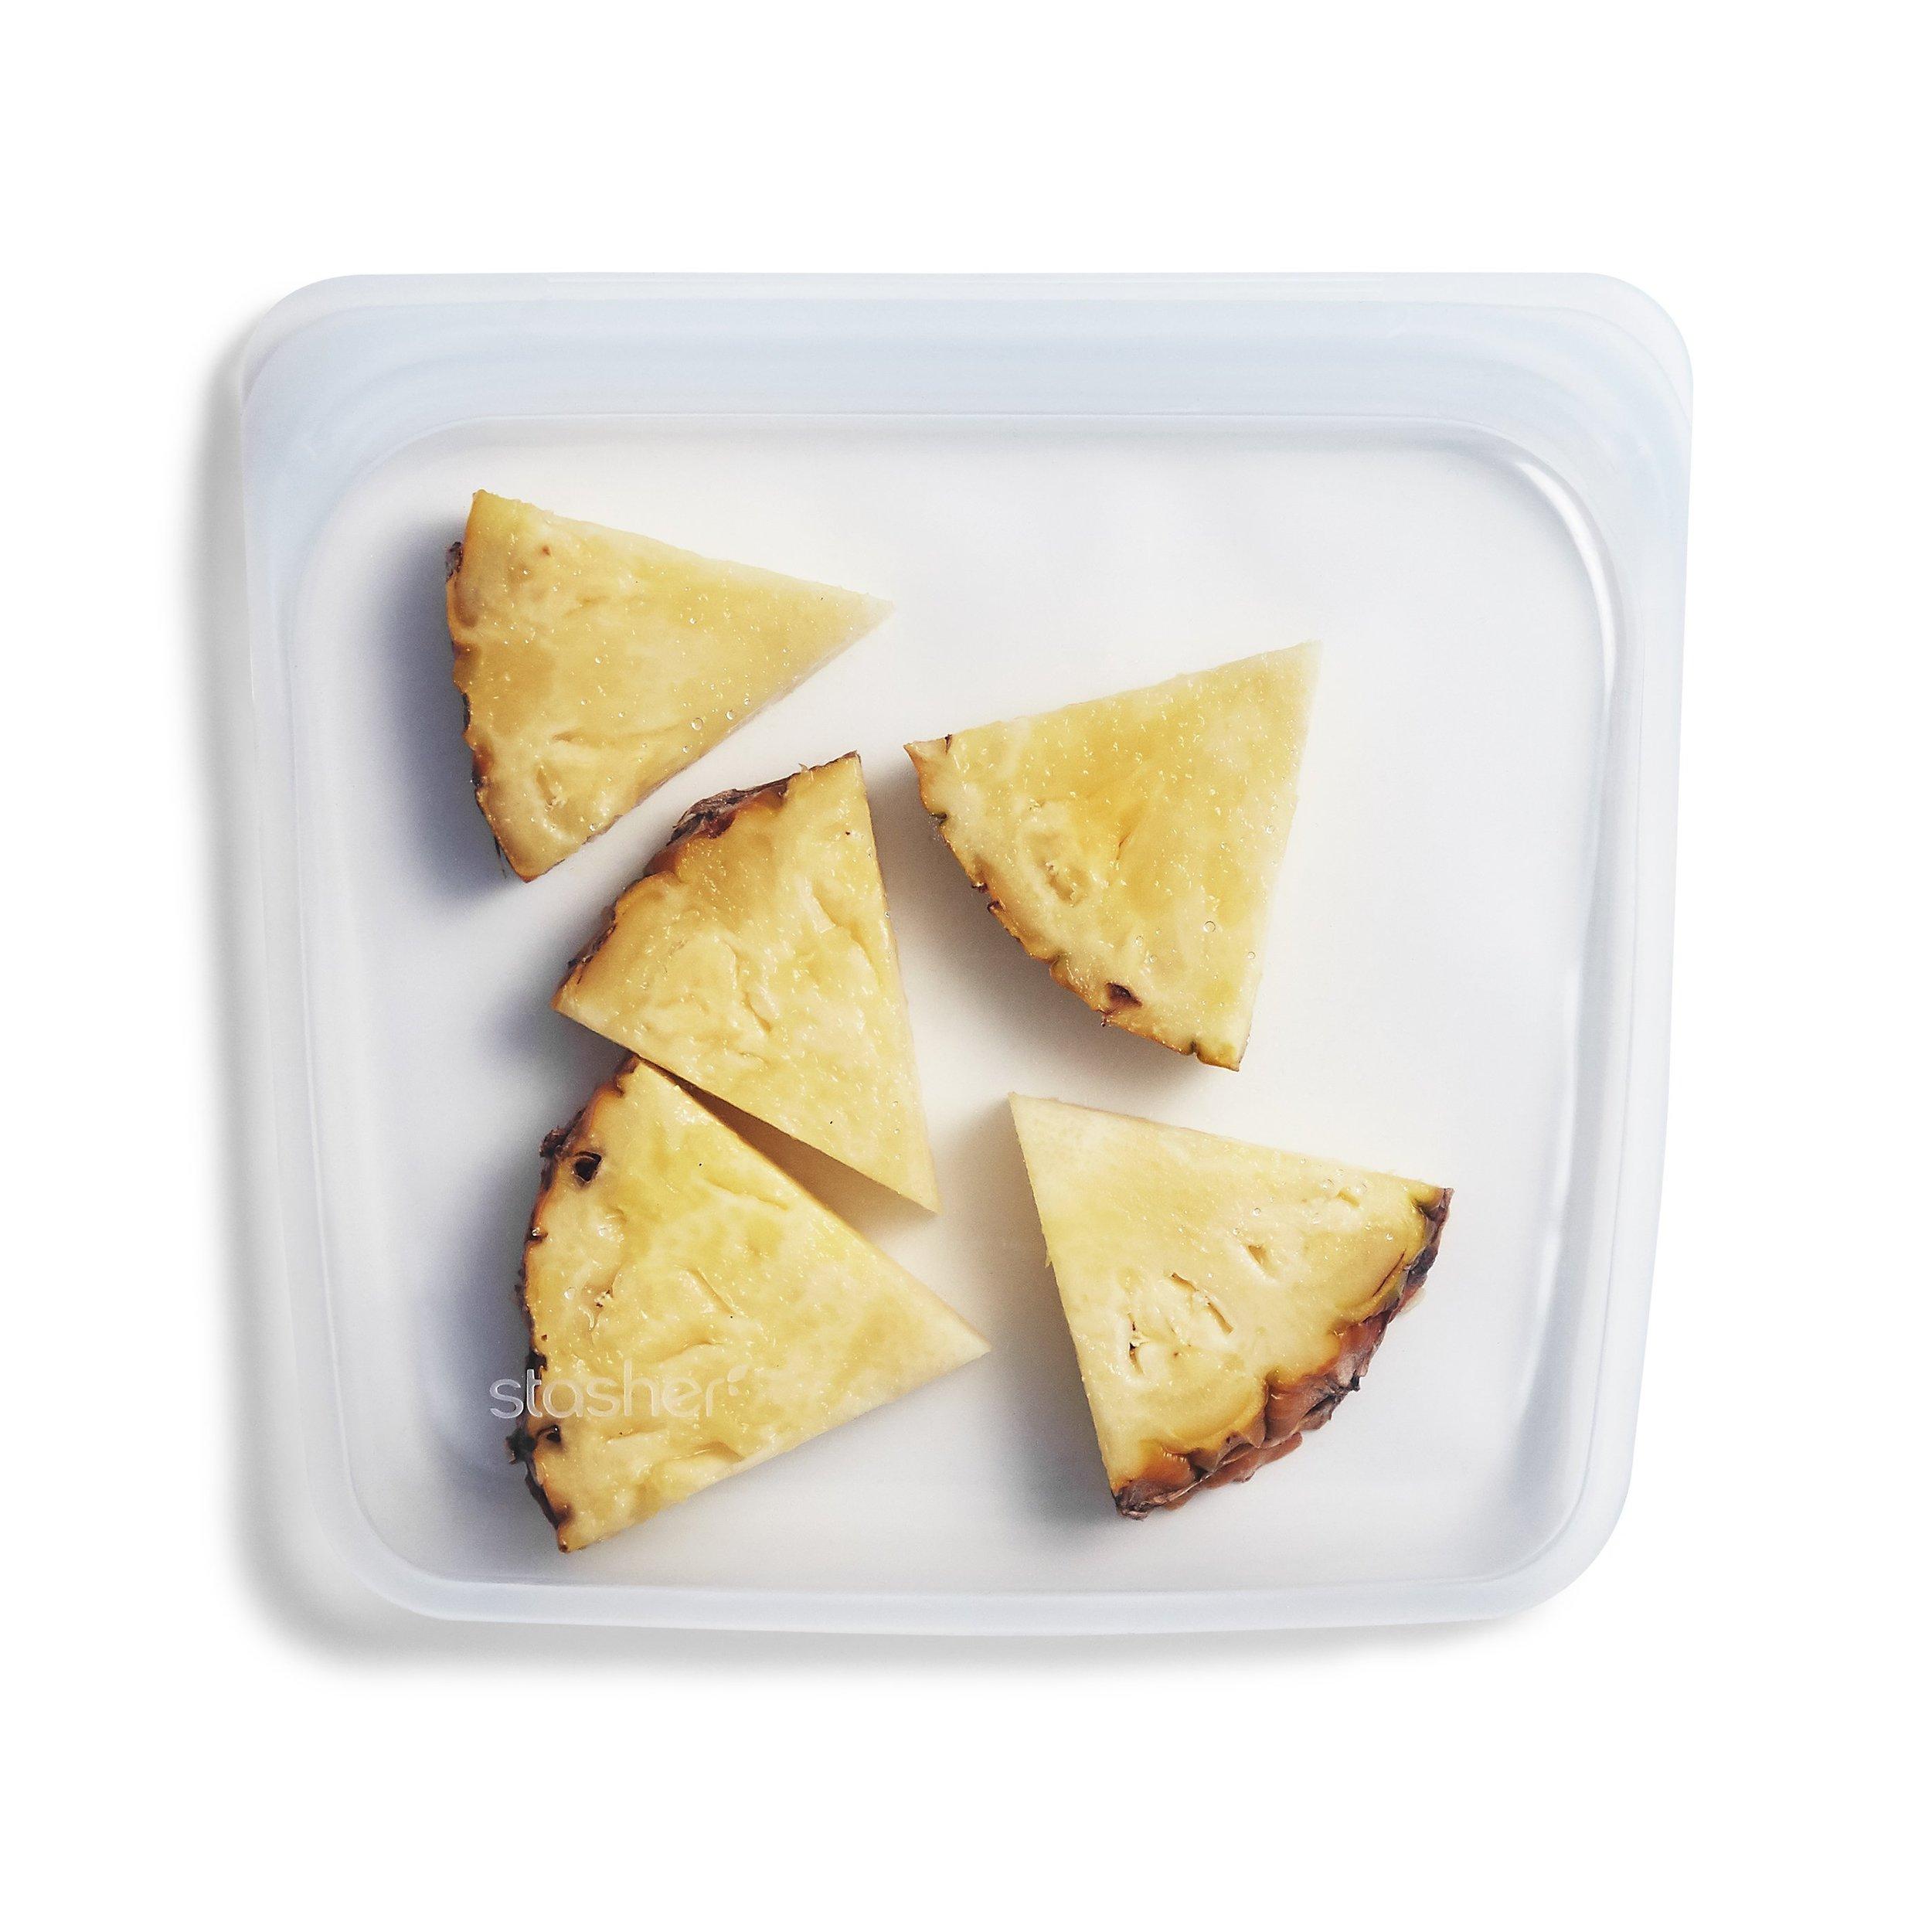 Sandwich_Clear_PS_Pineapple_7b811bd7-b2e1-4ace-b92c-895ba22ff58e_2800x.jpg